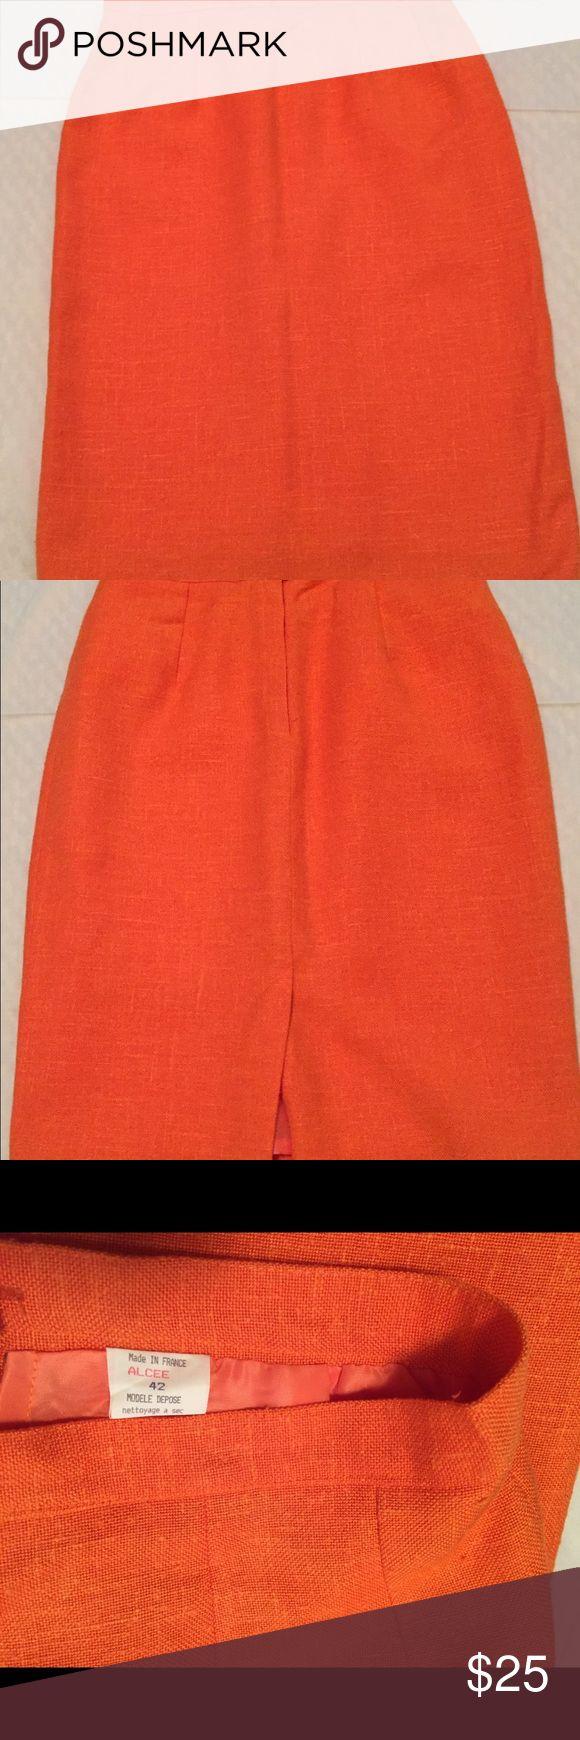 ALCEE Pumpkin Pencil Skirt, Euro Sz 42, US Sz 12